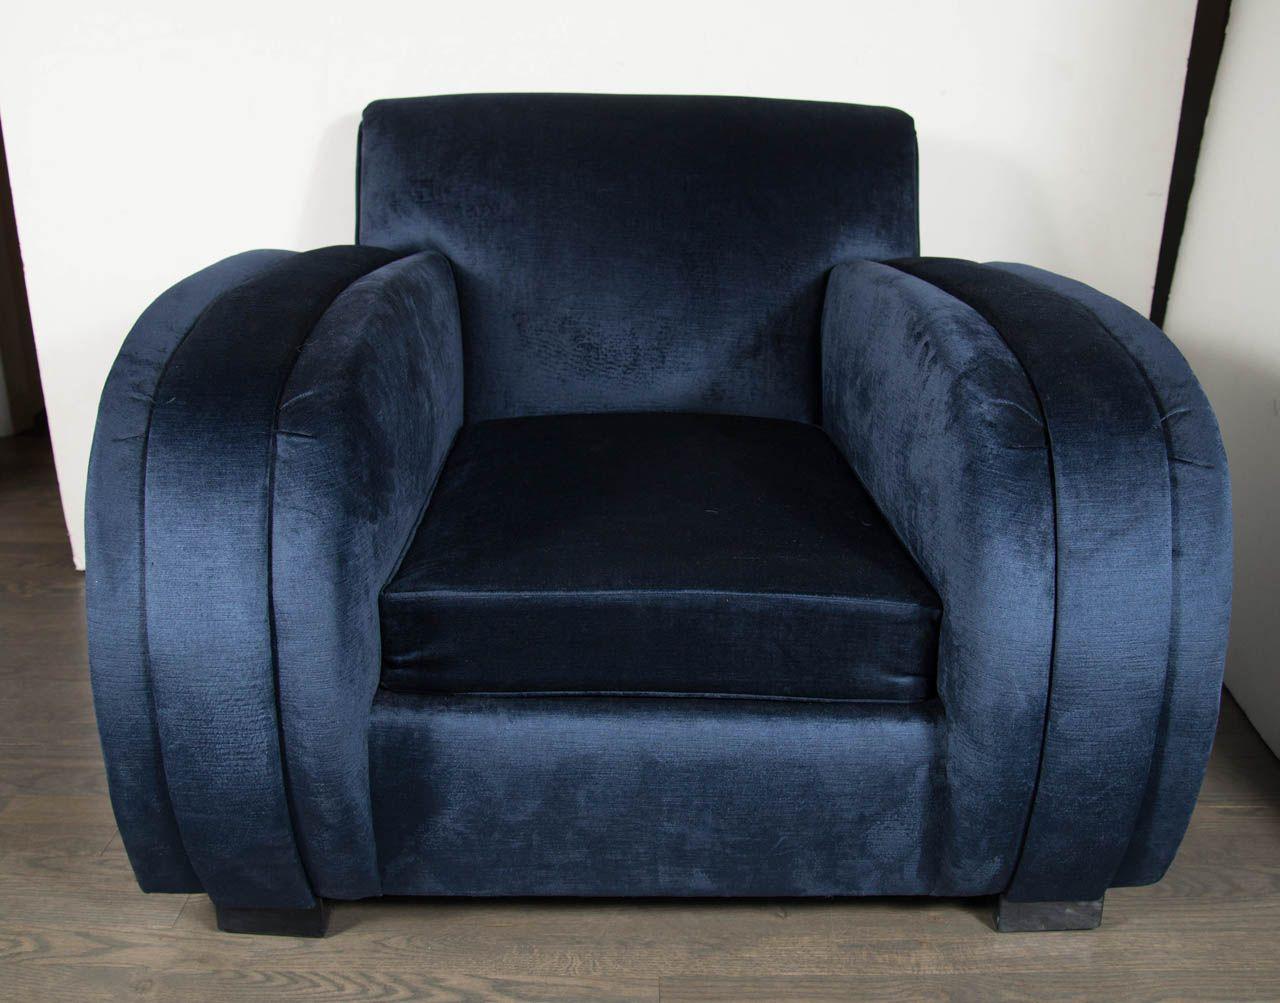 Sedie Deco ~ Art deco streamlined club chair in sapphire blue velvet upholstery